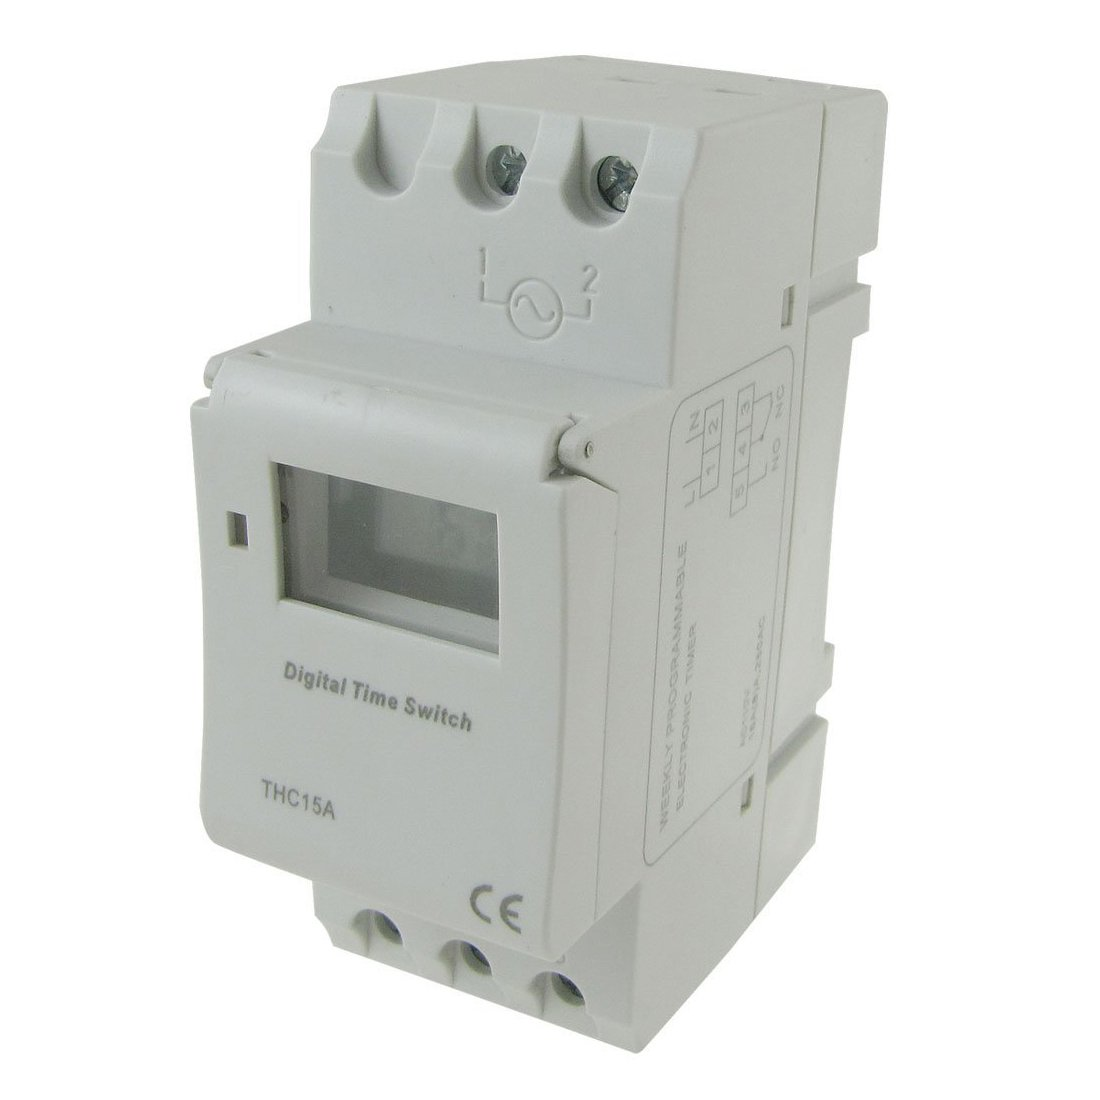 THC15A Programmable Timer - SODIAL(R)DIN Rail Mounting Weekly Programmable Electronic Timer THC15A AC 110V